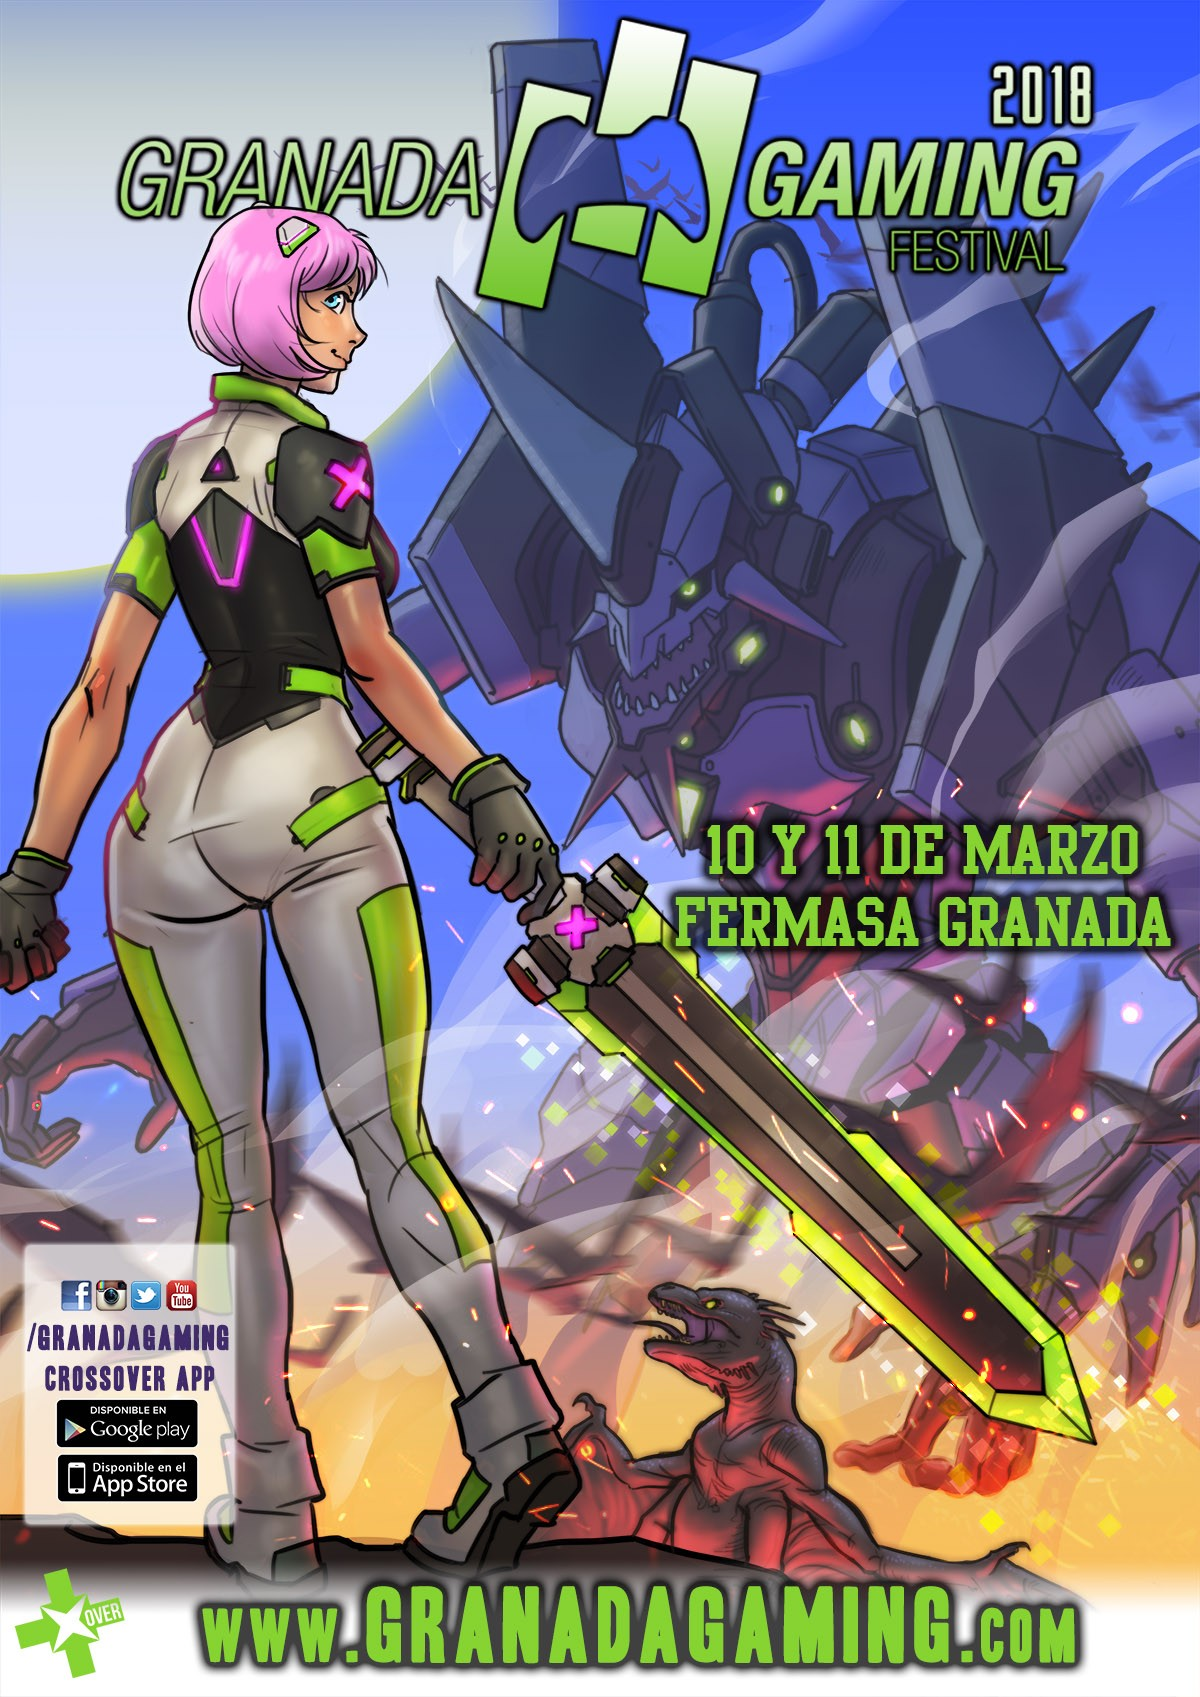 Granada Gaming Festival - Granada